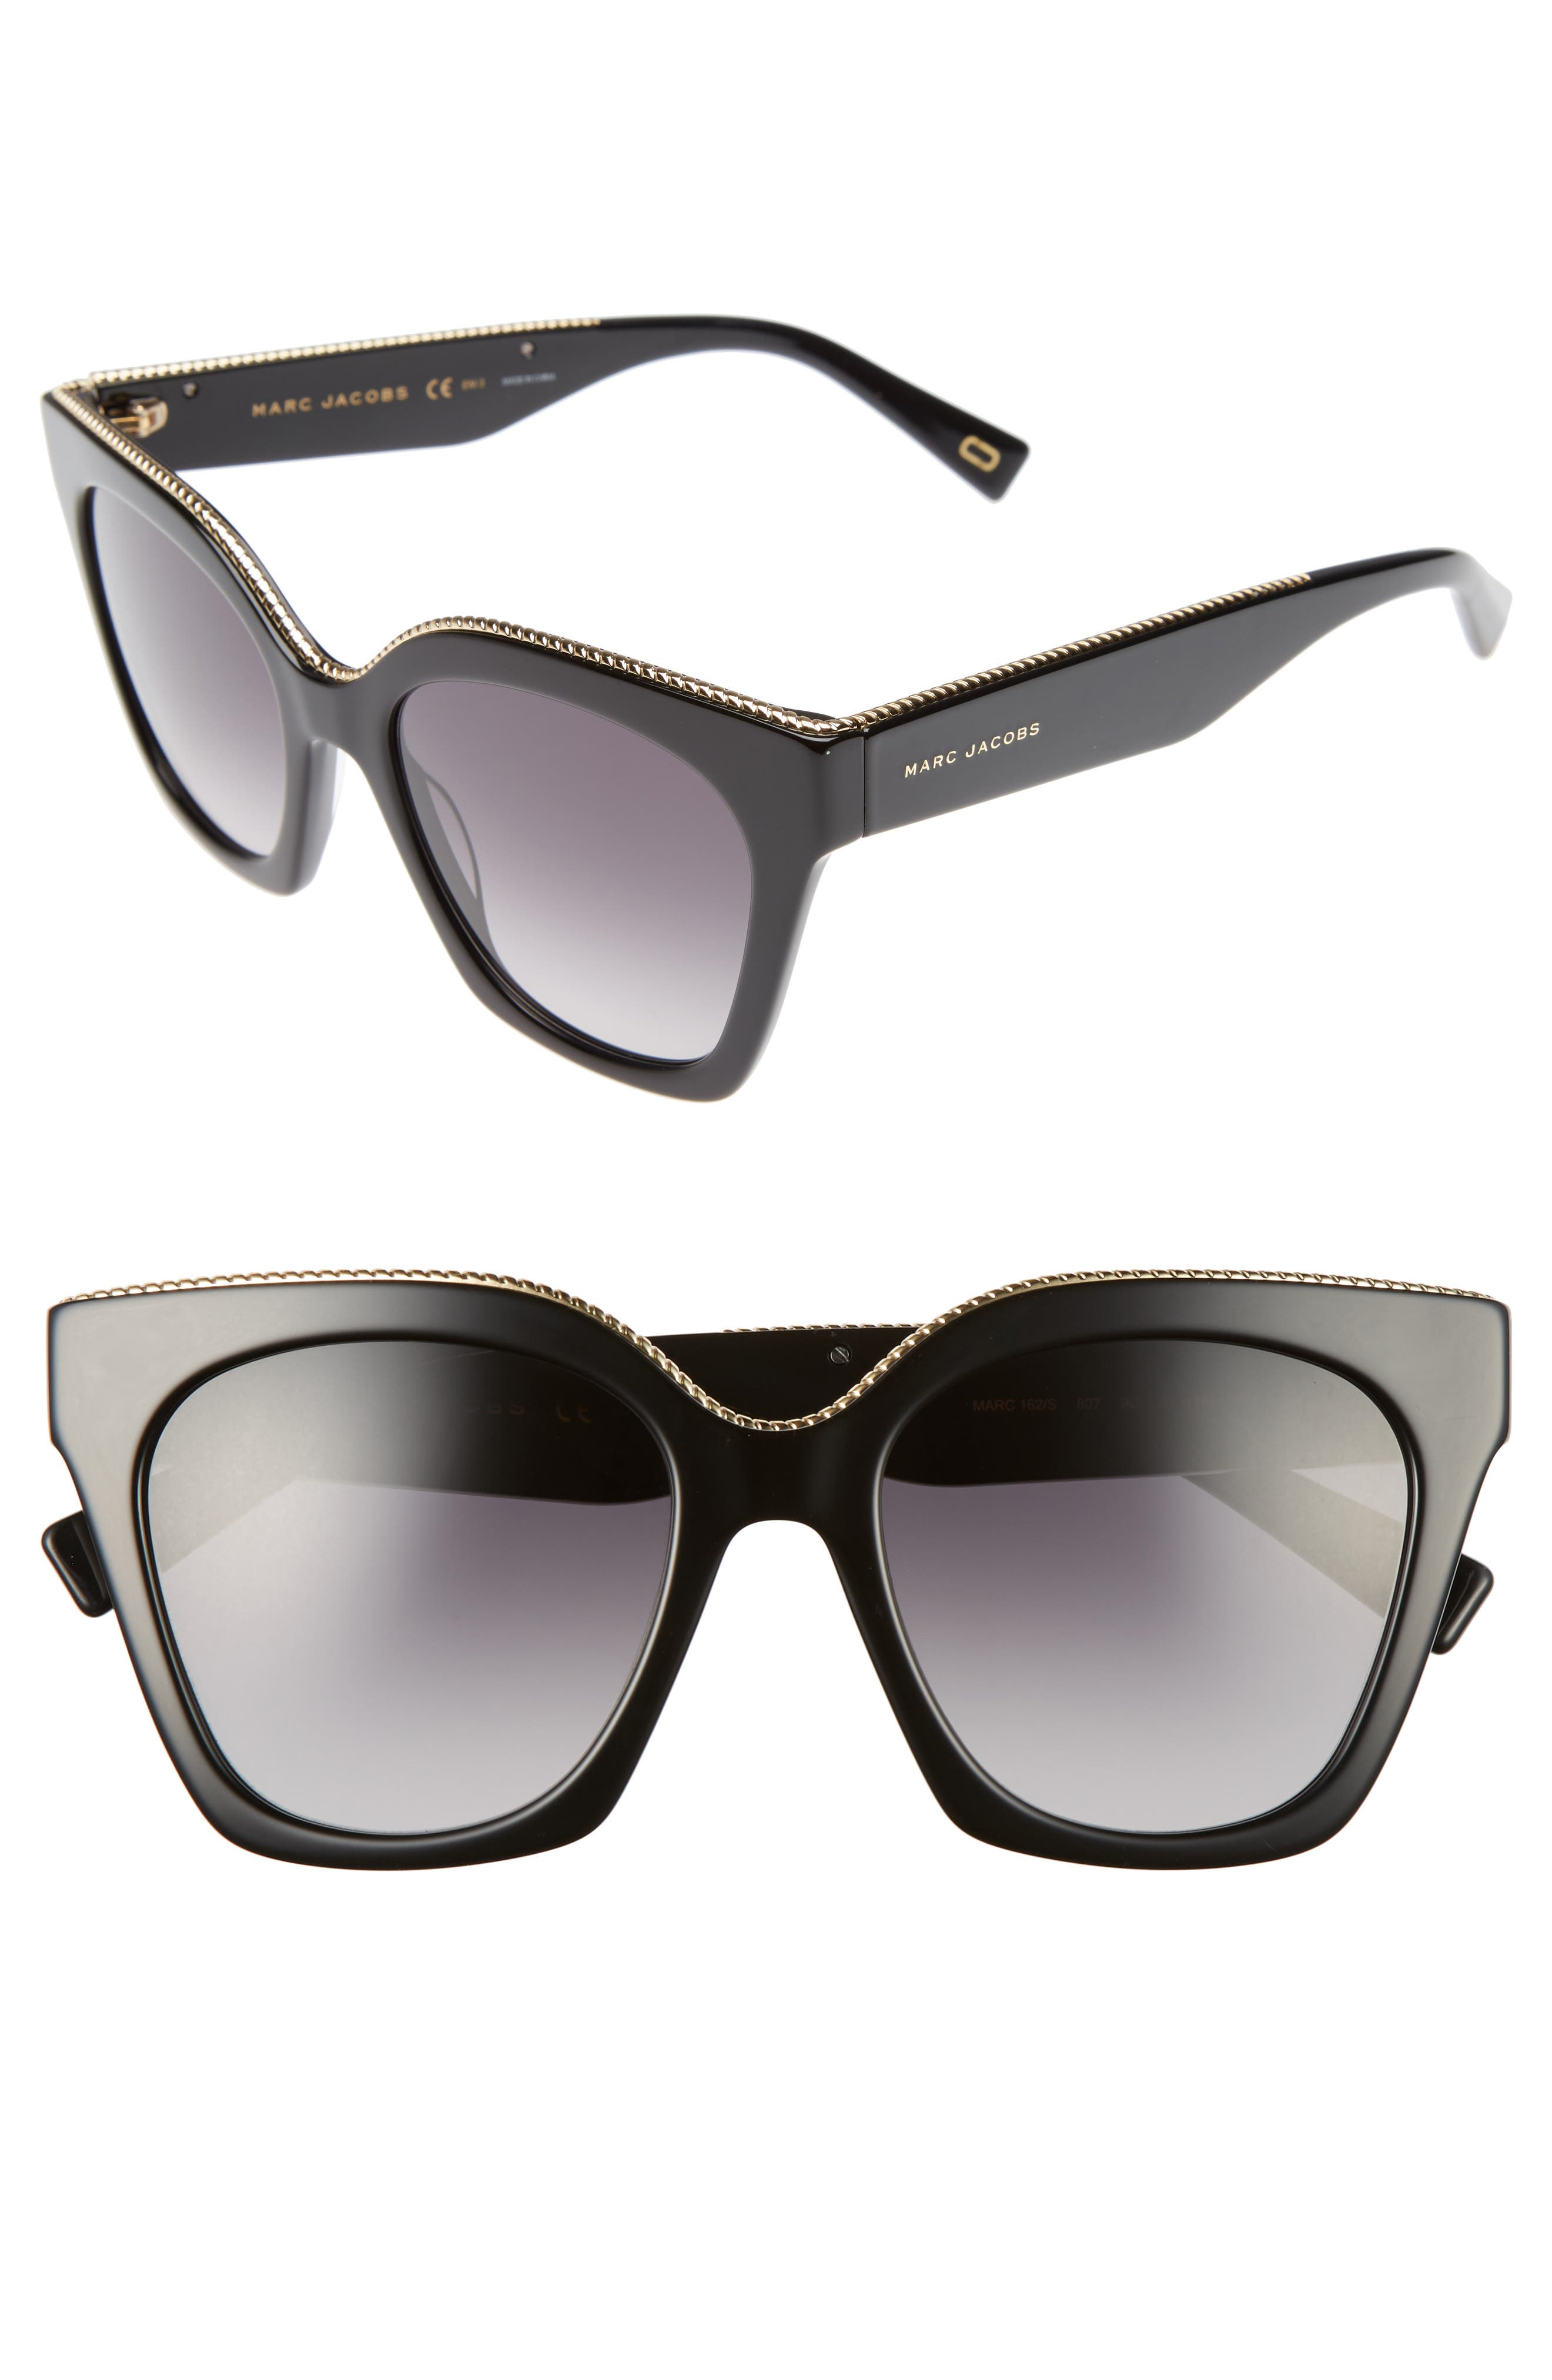 52mm Square Sunglasses,                             Main thumbnail 1, color,                             001